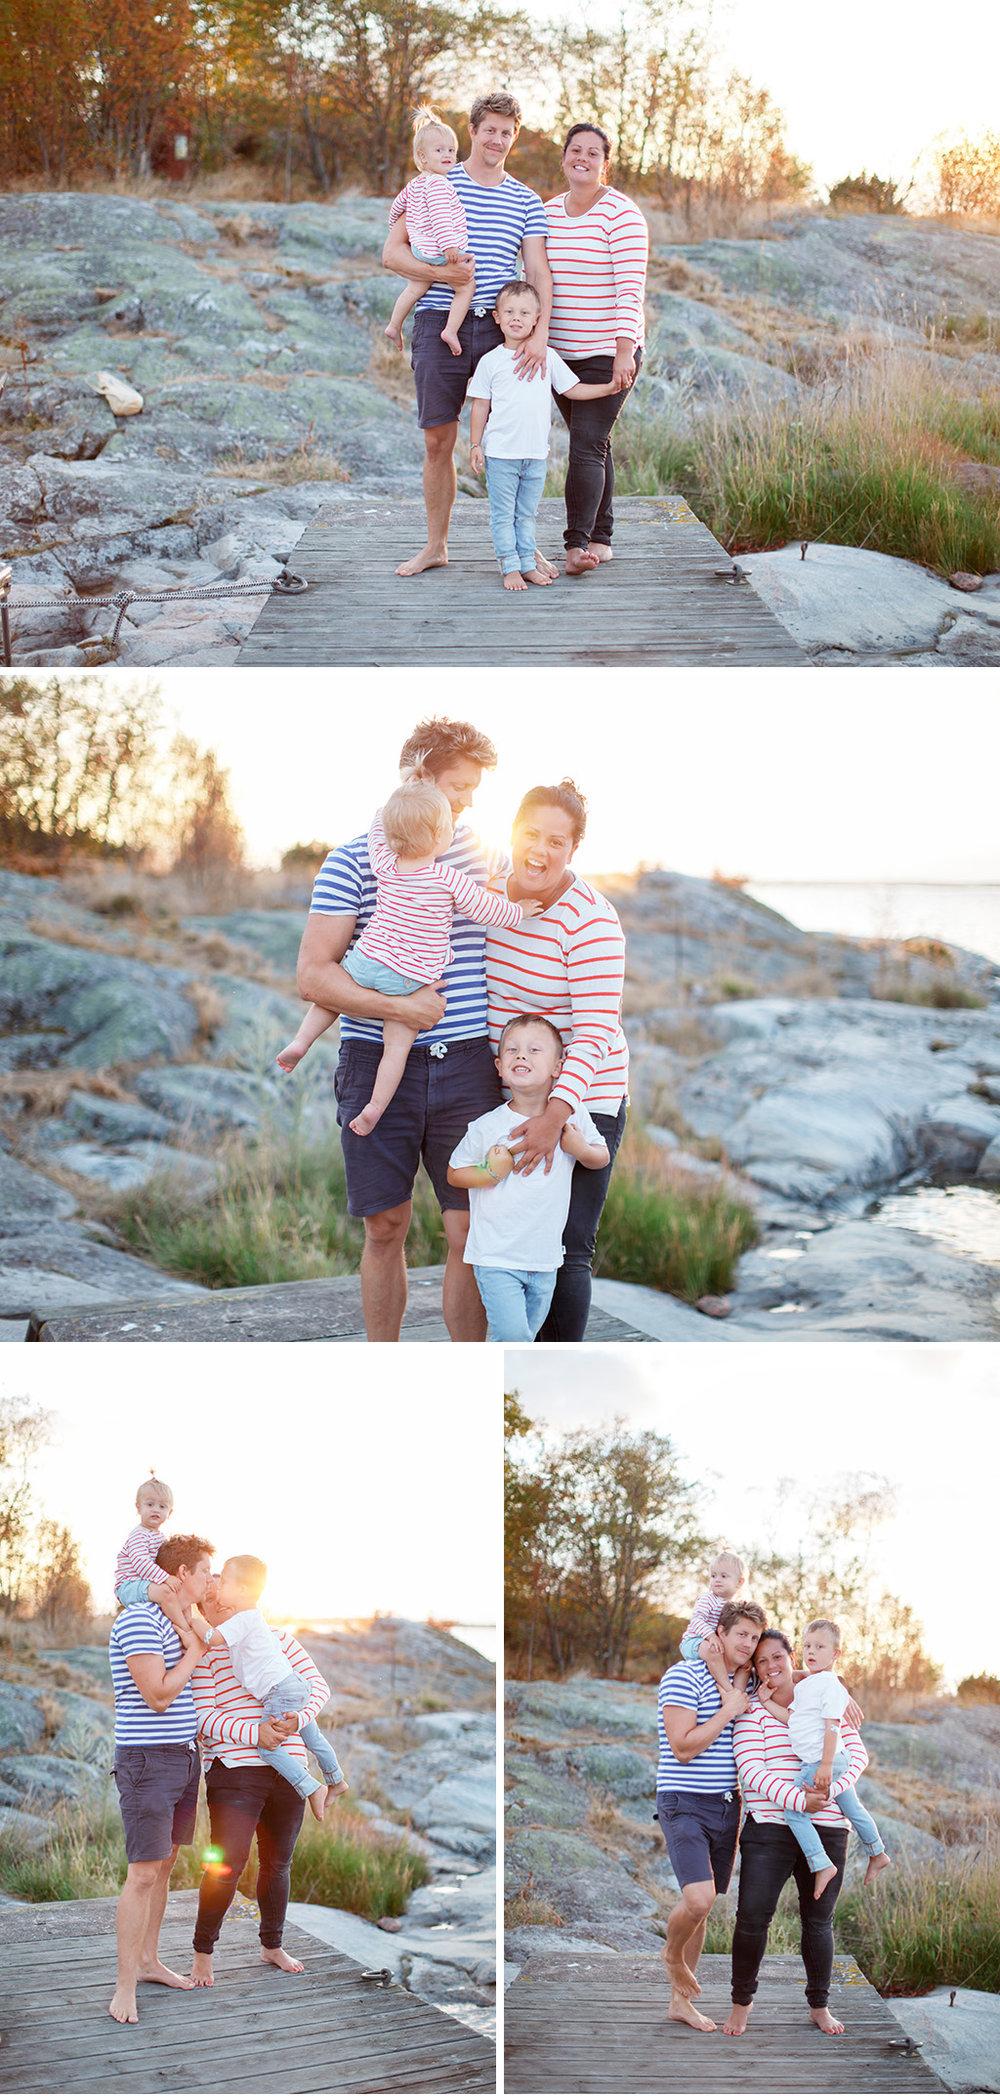 Familjefotografering-Stockholms_Skargard_1.jpg